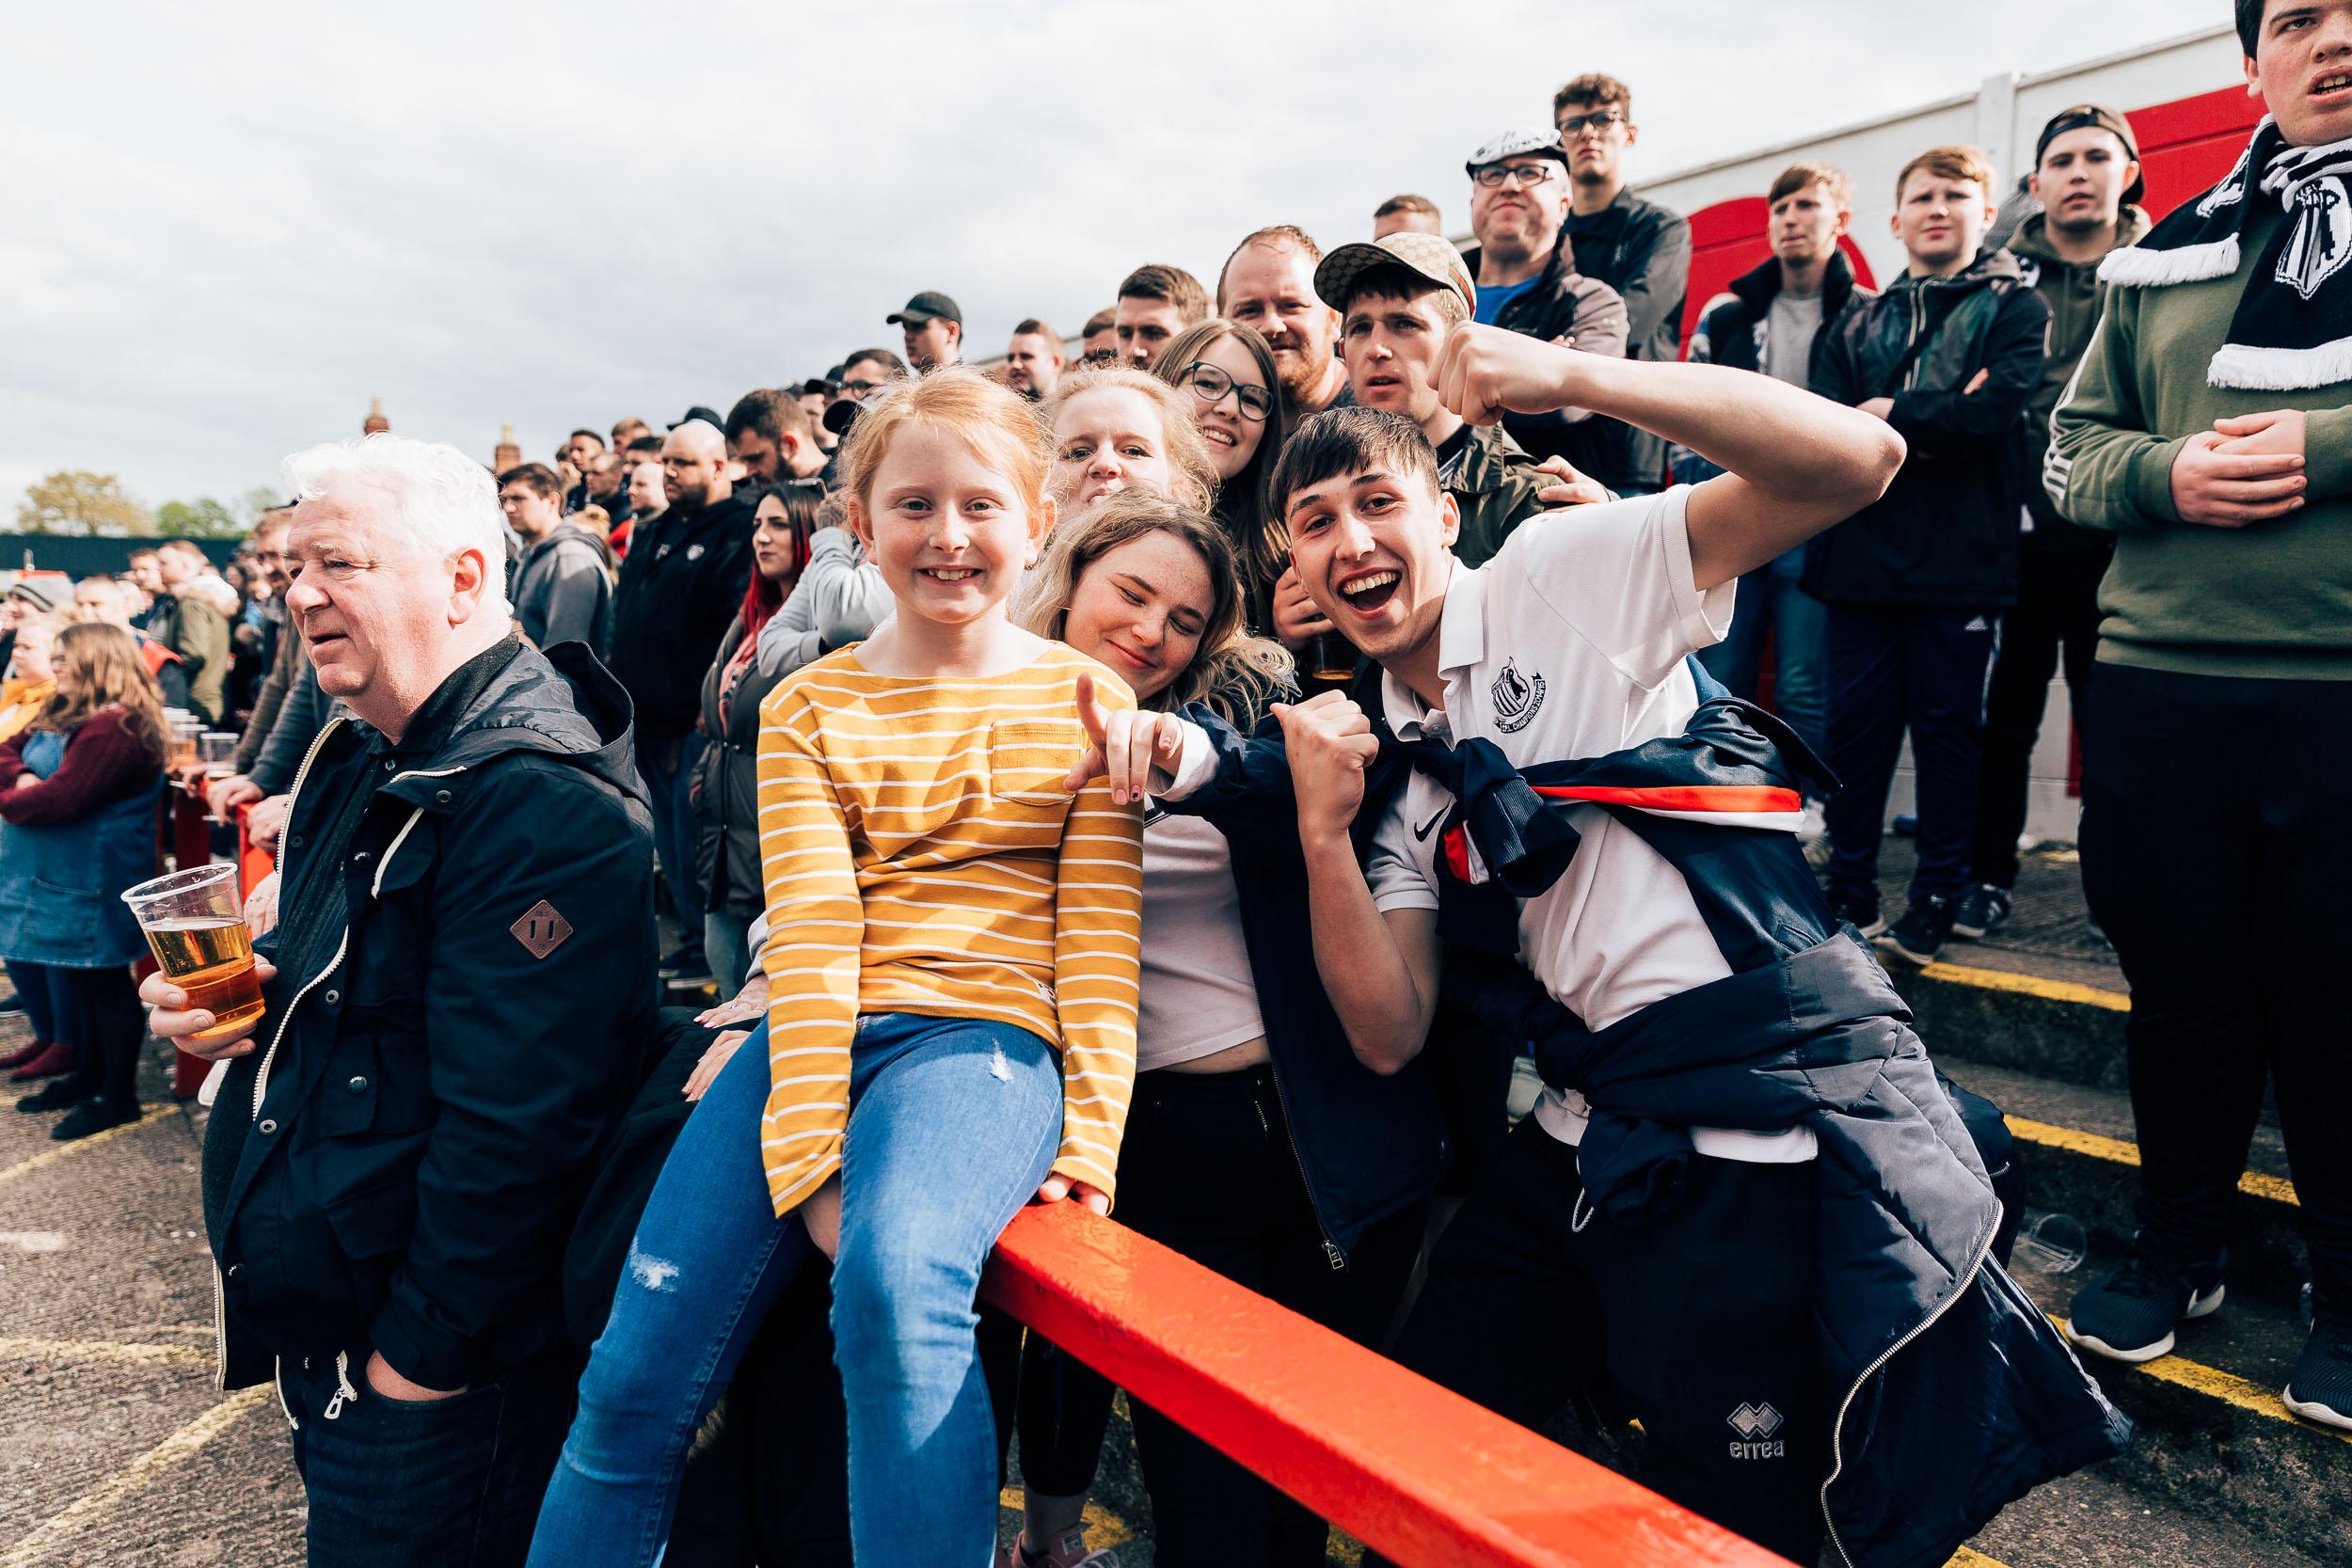 06_05_2019_Bromsgrove_Sporting_Corby-153.jpg